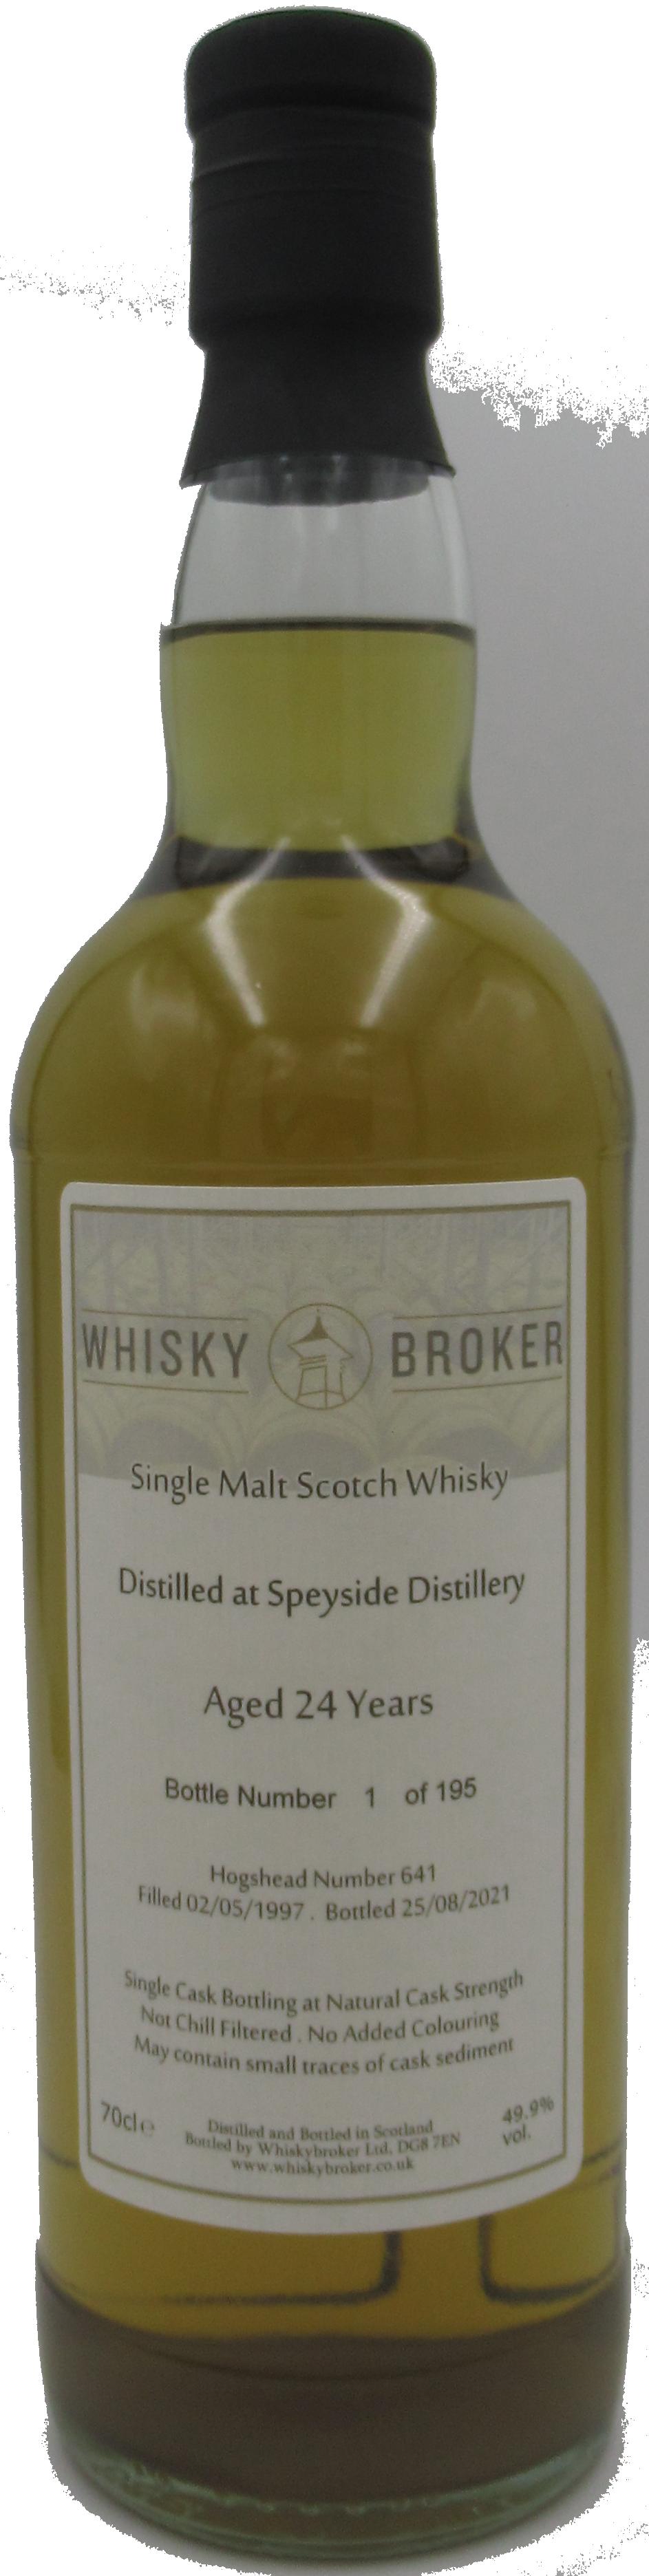 70cl, 24yo Distilled at Speyside Distillery